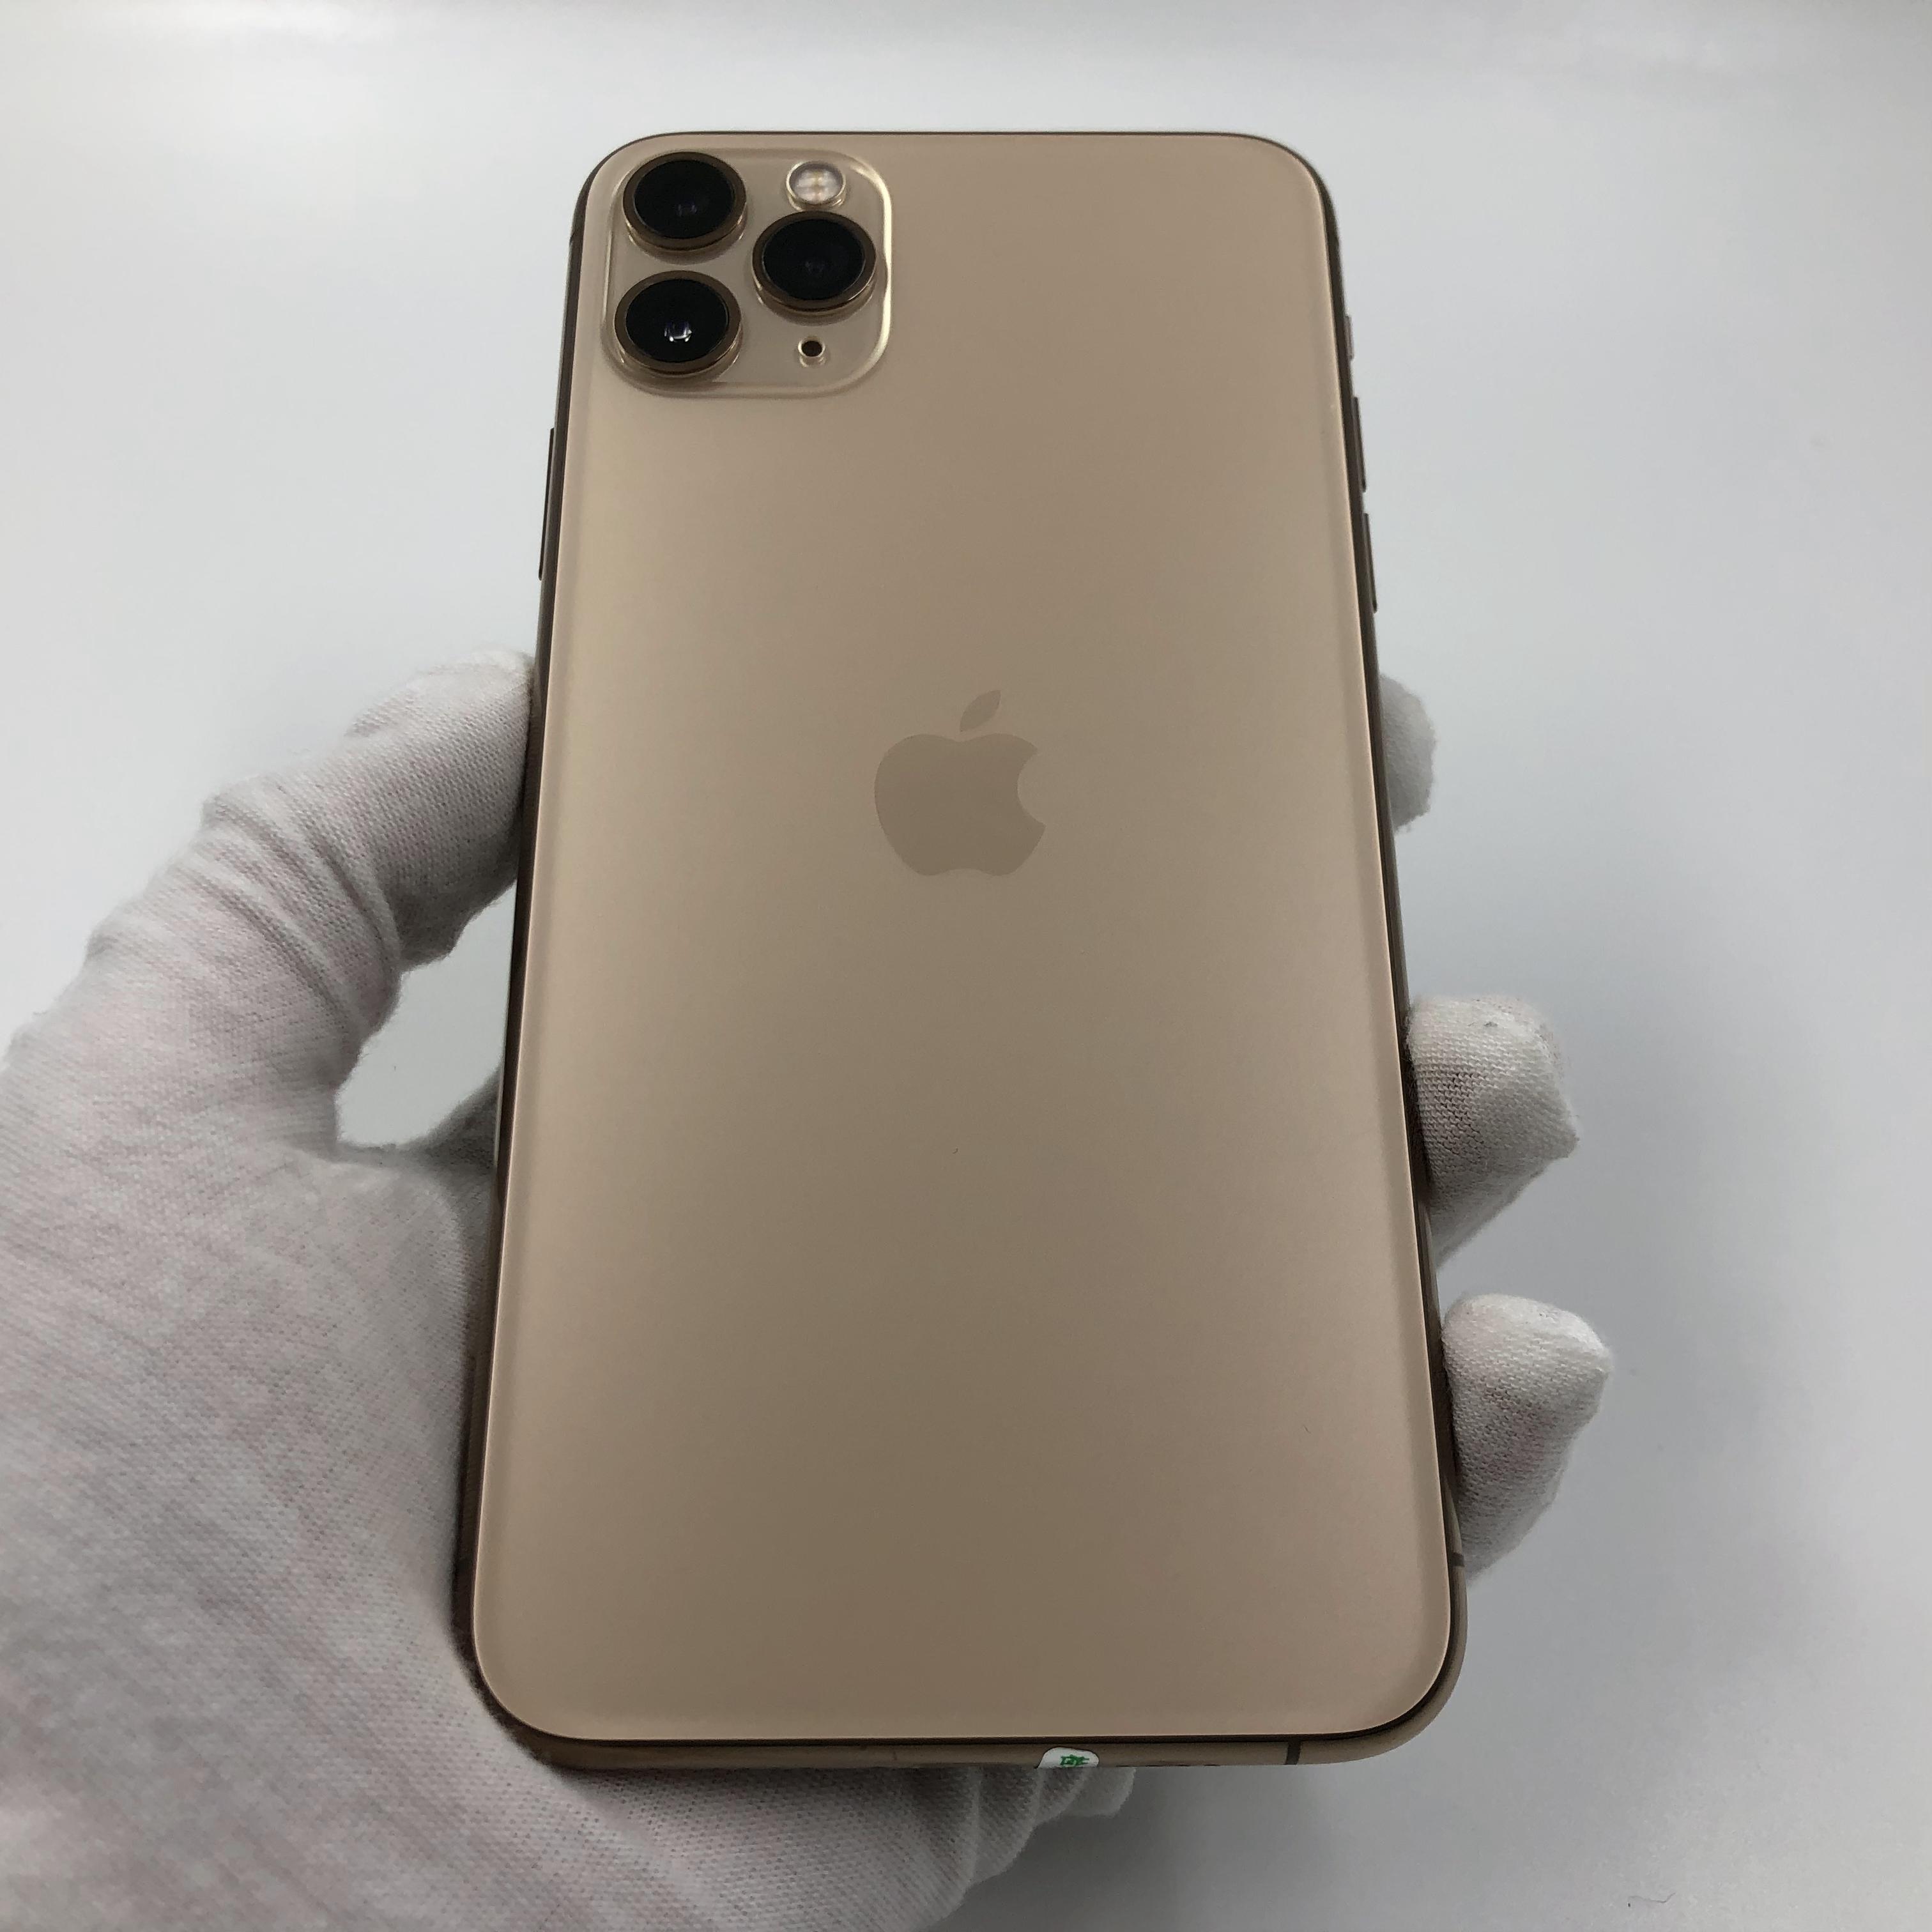 苹果【iPhone 11 Pro Max】95新